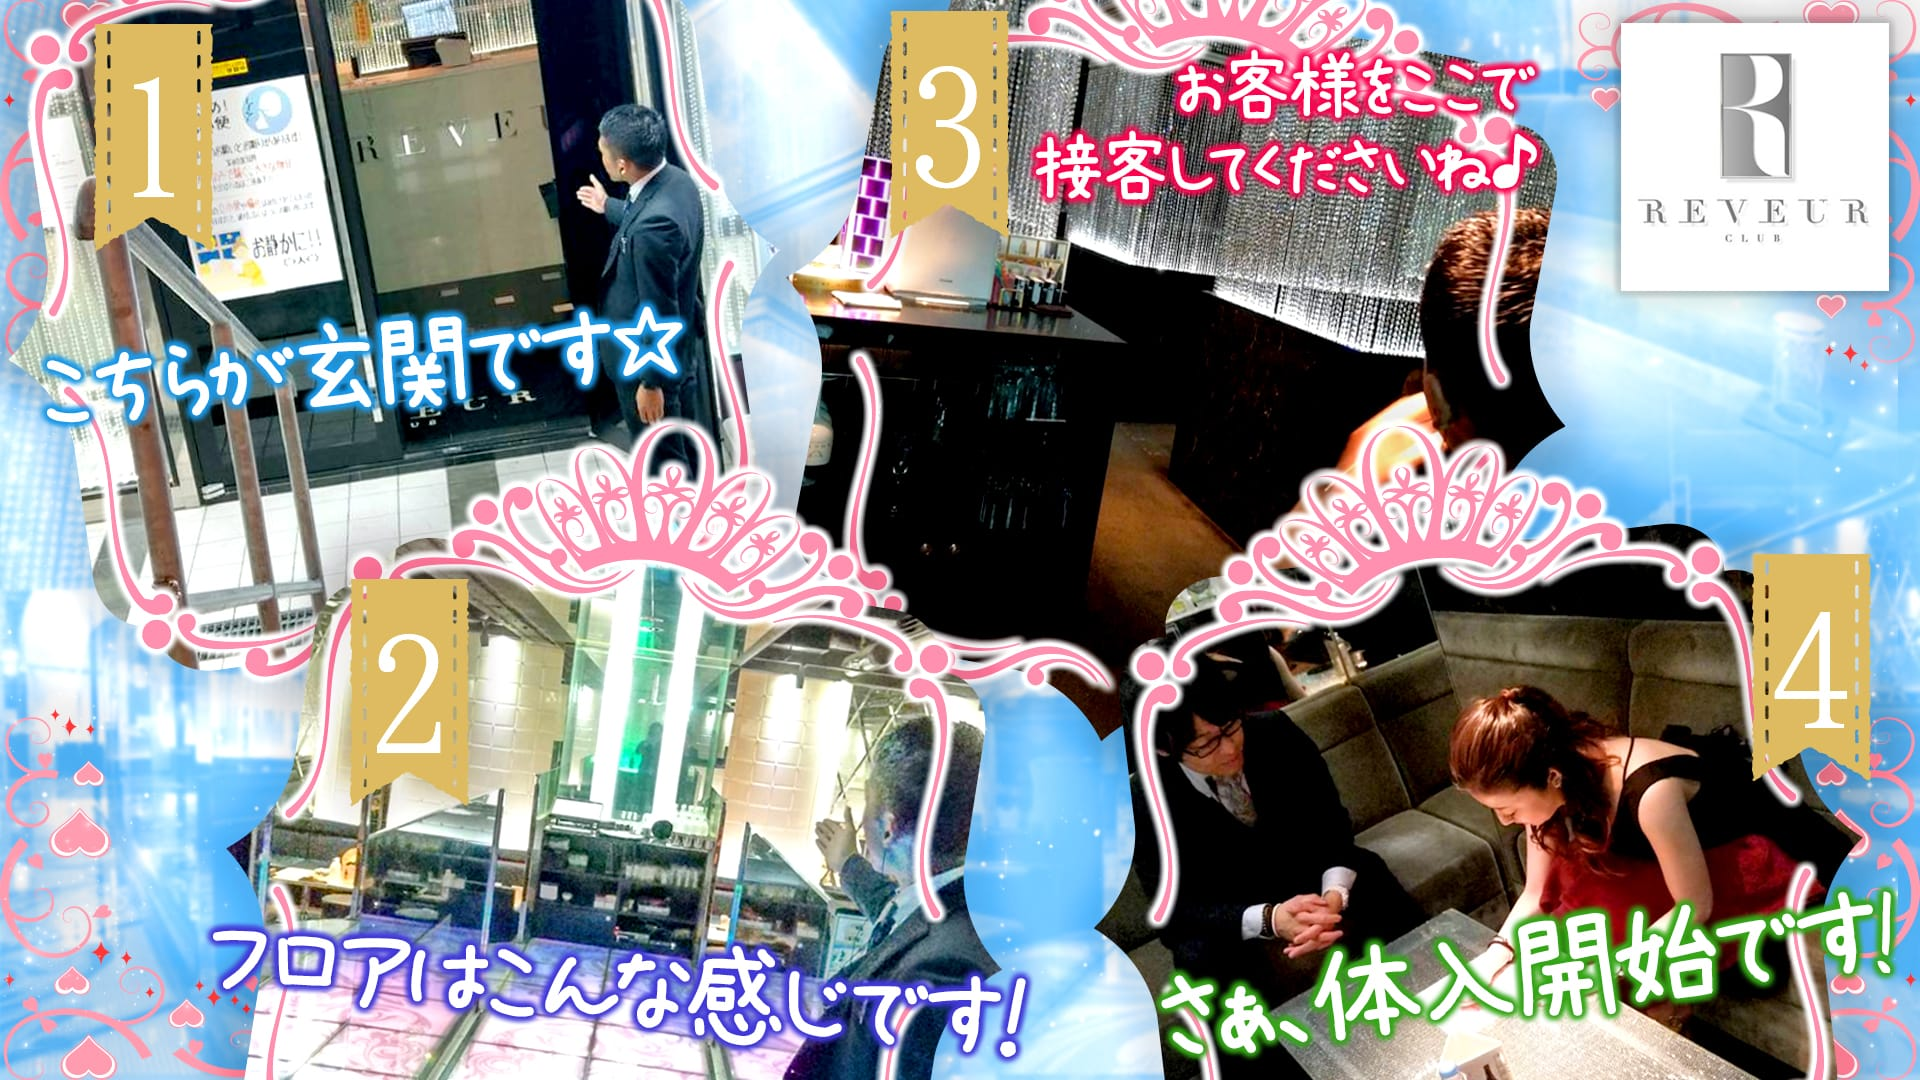 REVEUR[リヴェール] 高円寺 キャバクラ TOP画像